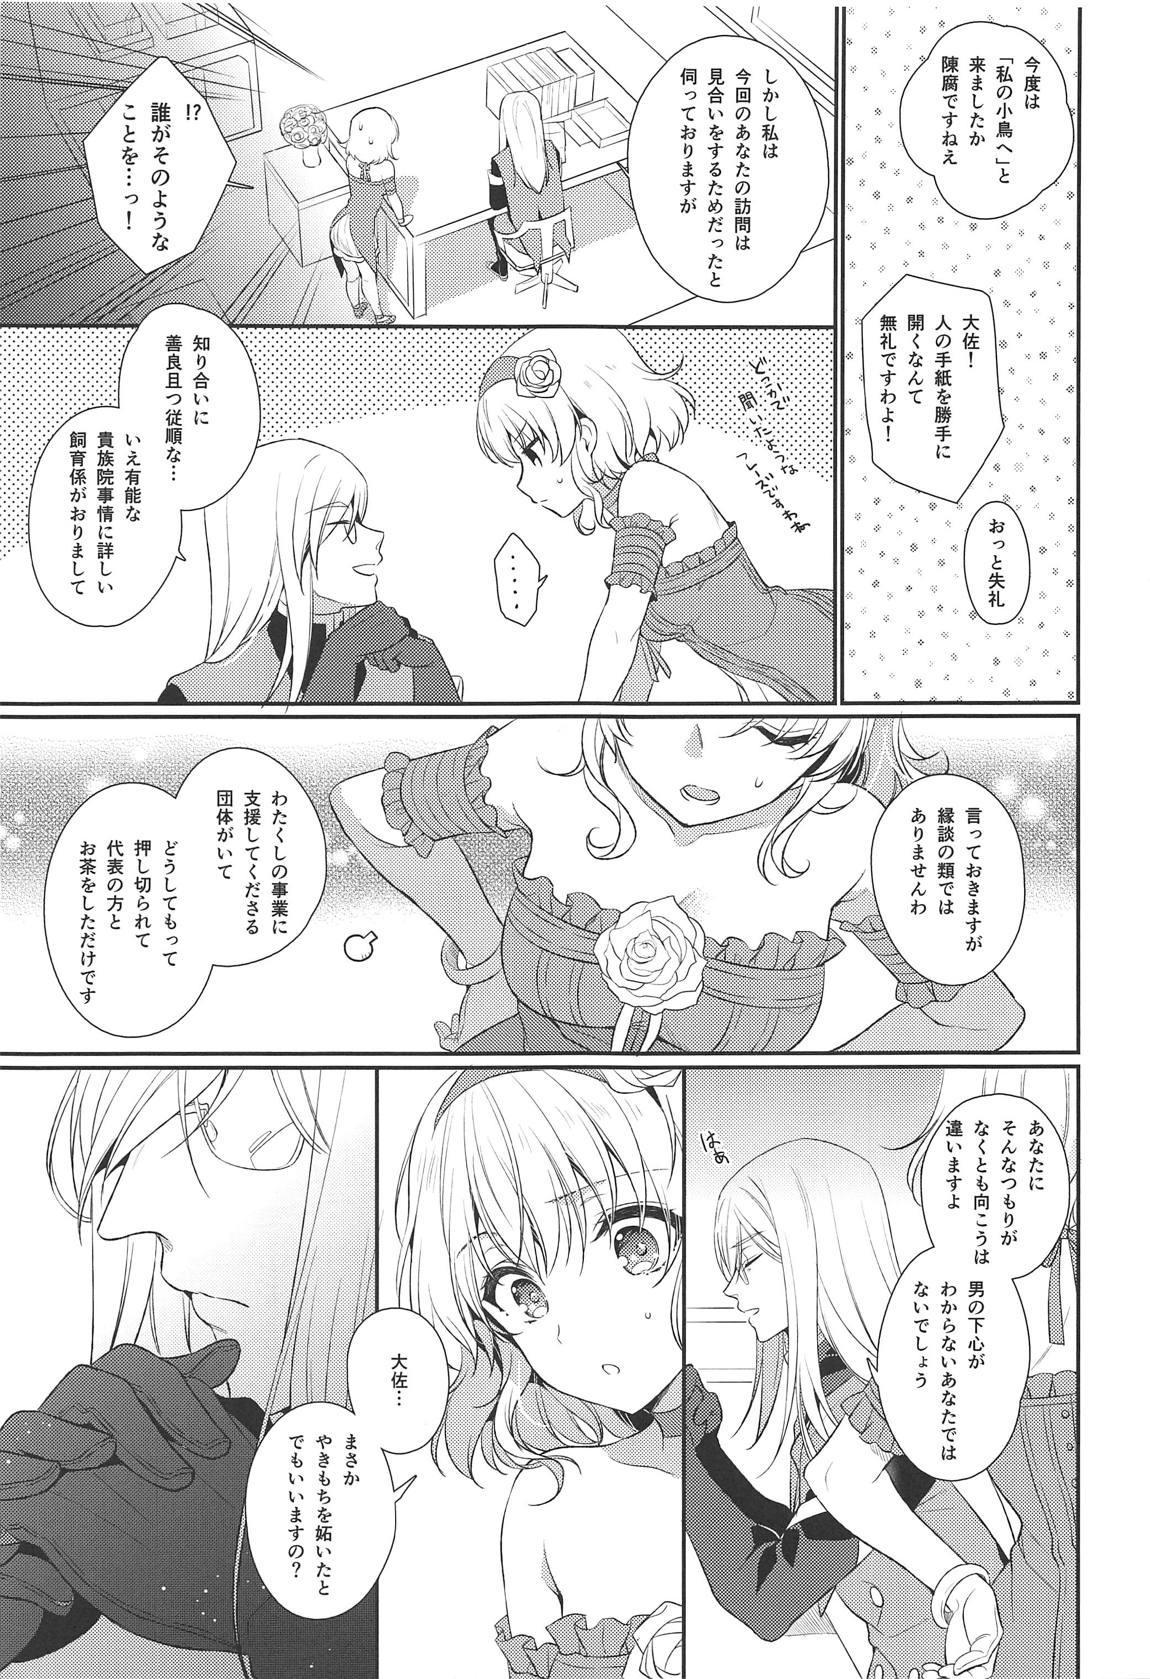 Marking Princess 5